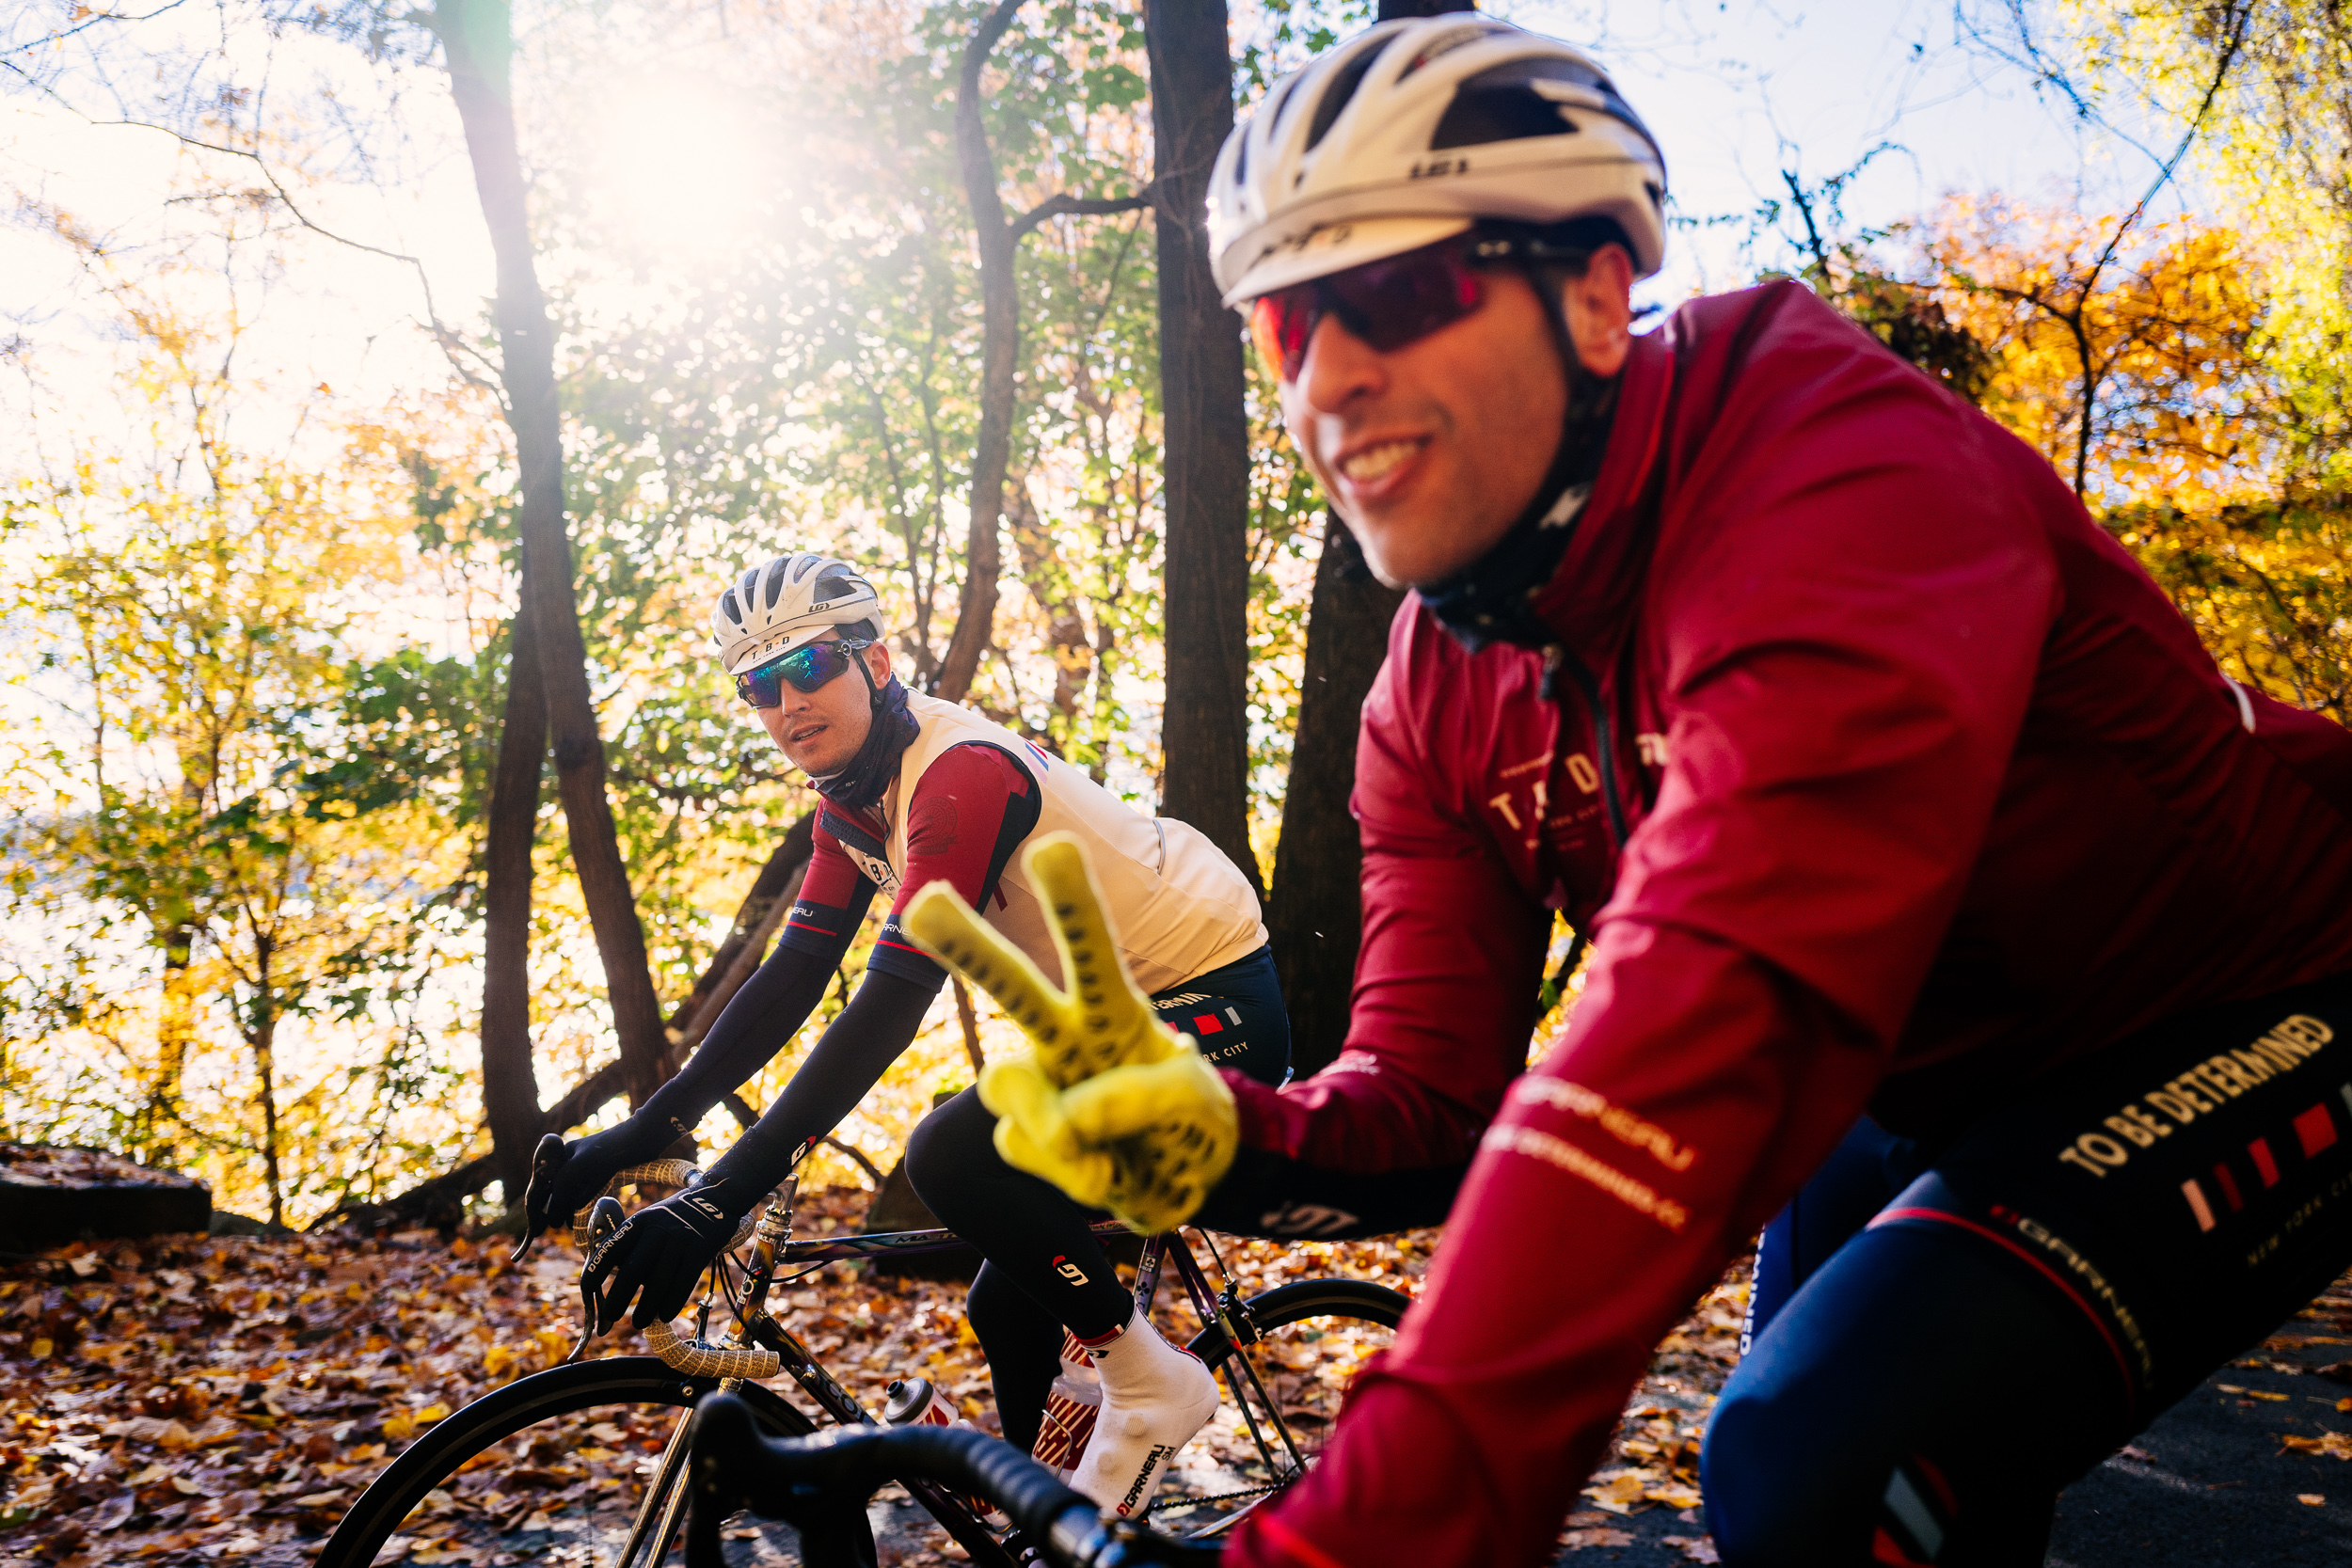 photo-rhetoric-to-be-determined-river-road-fall-foliage-5023.jpg